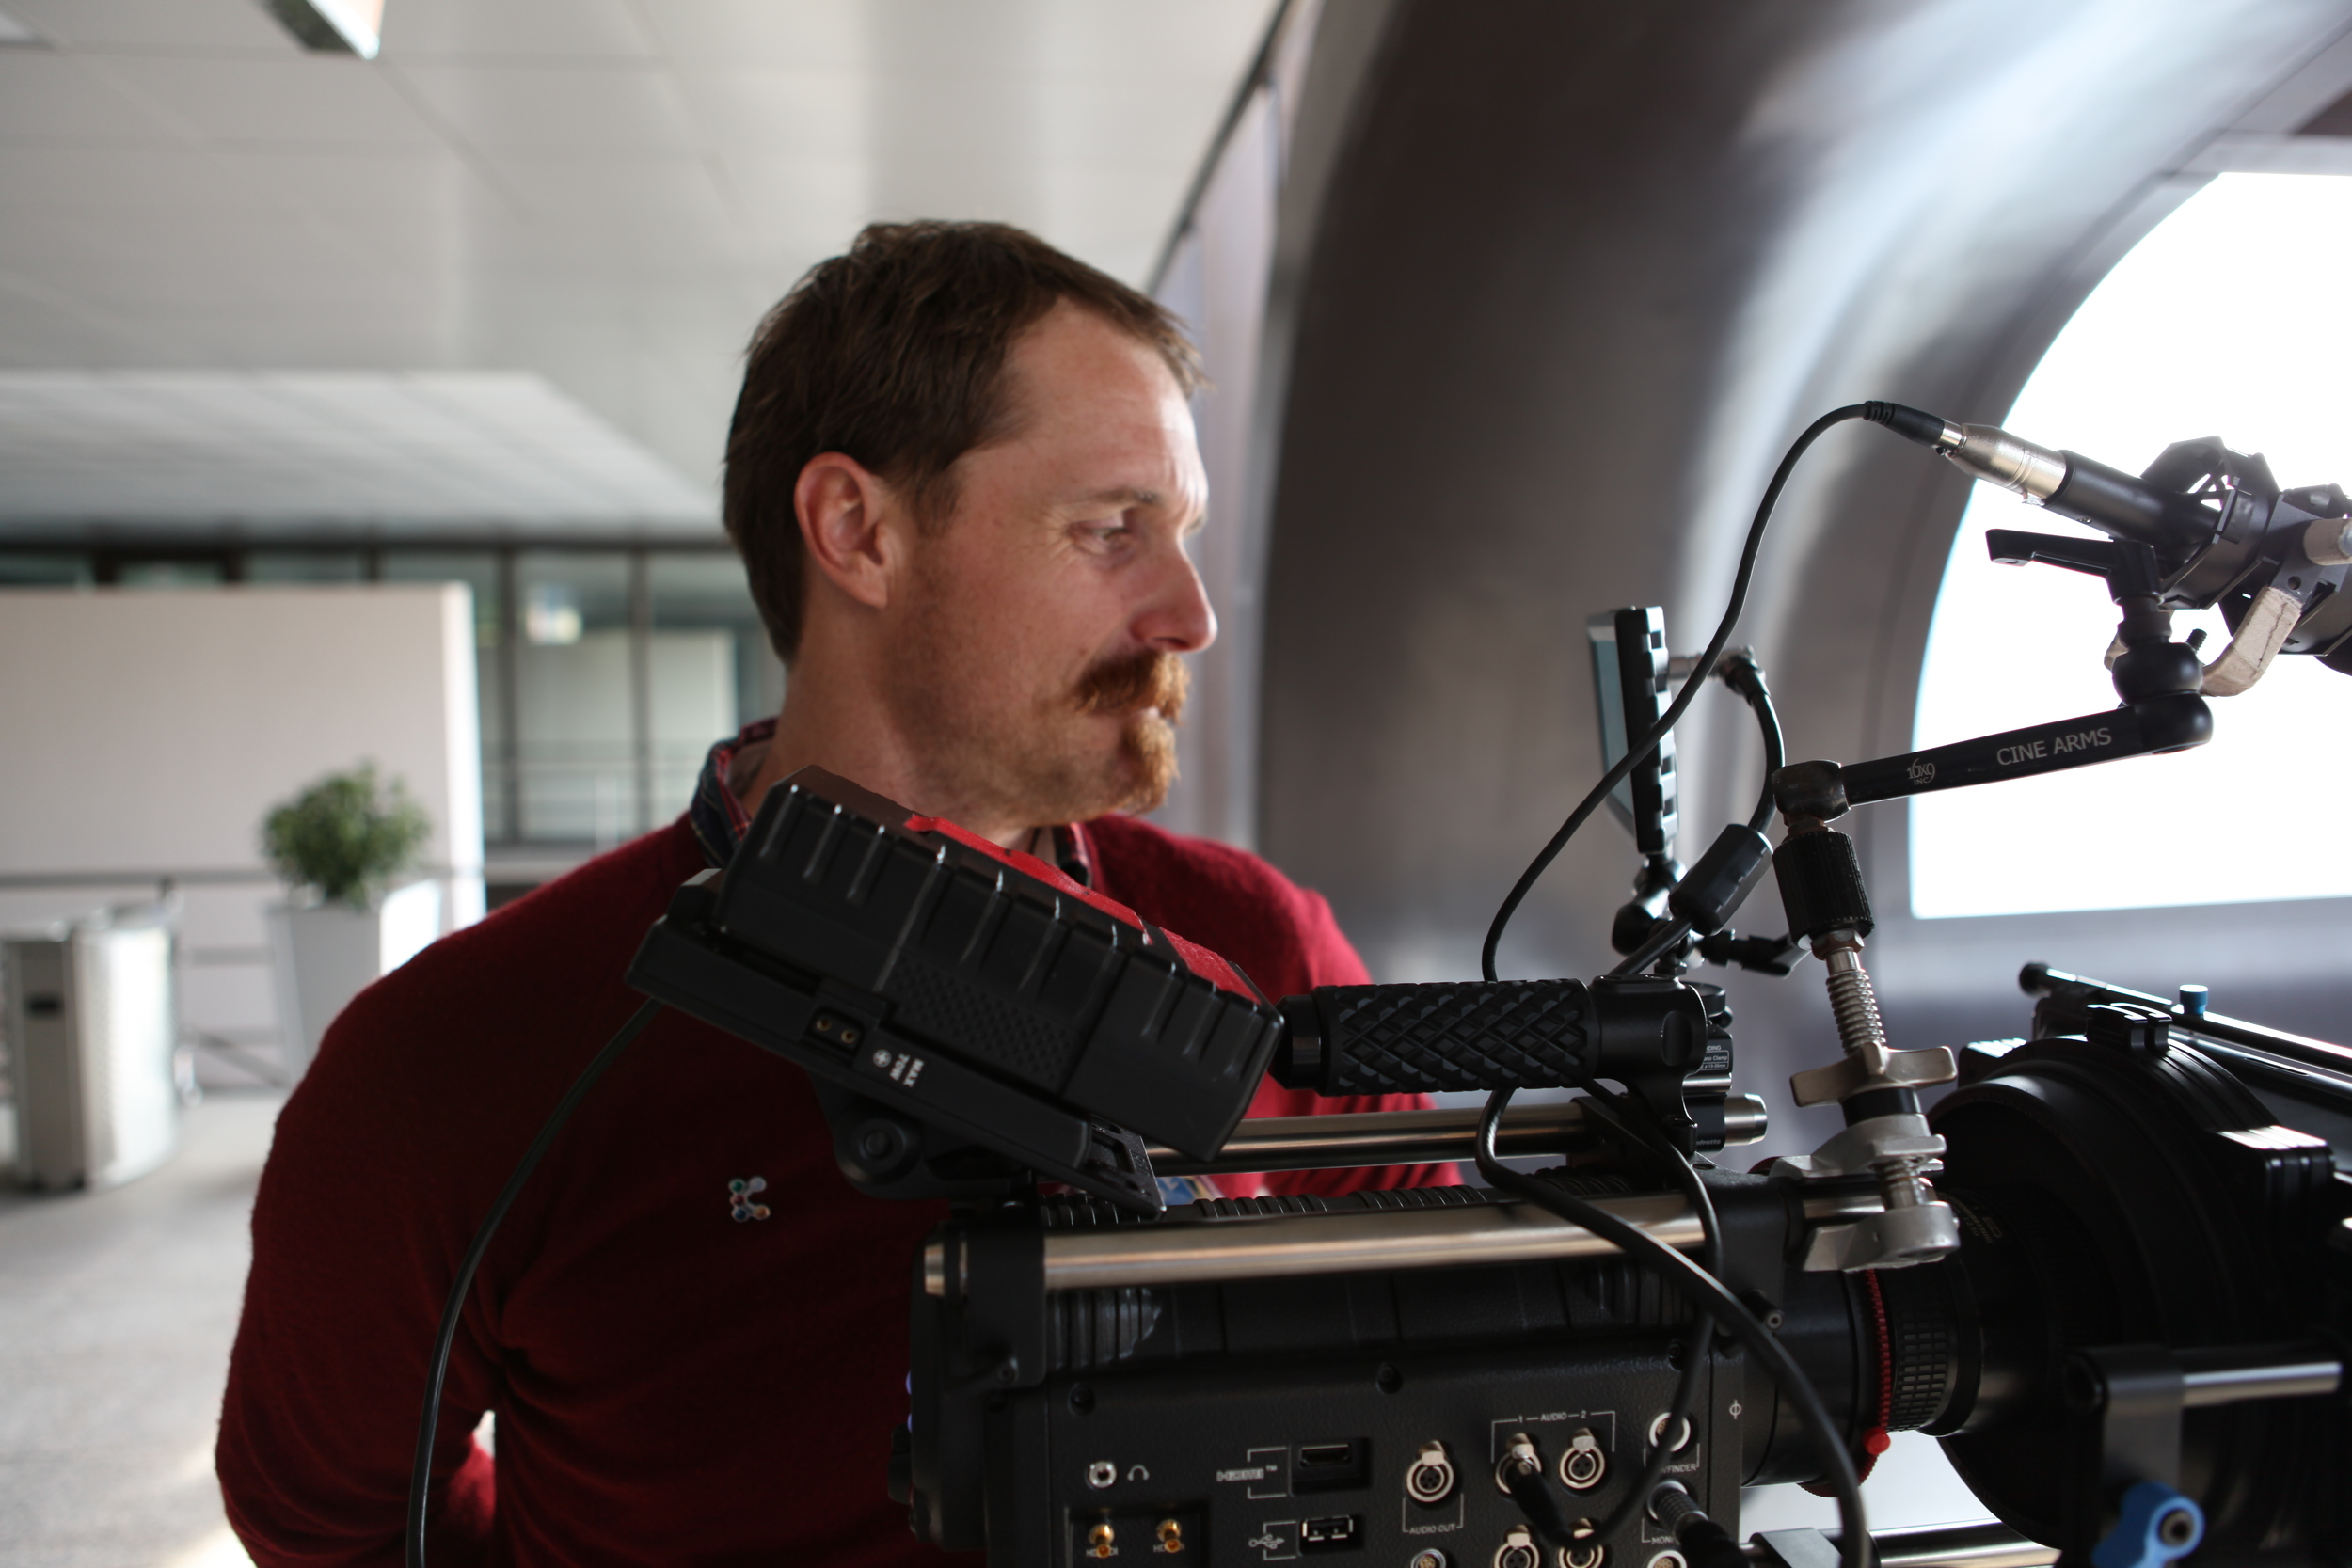 Director / DP Vern Moen shooting broll at the K-show in Dusseldorf, Germany.